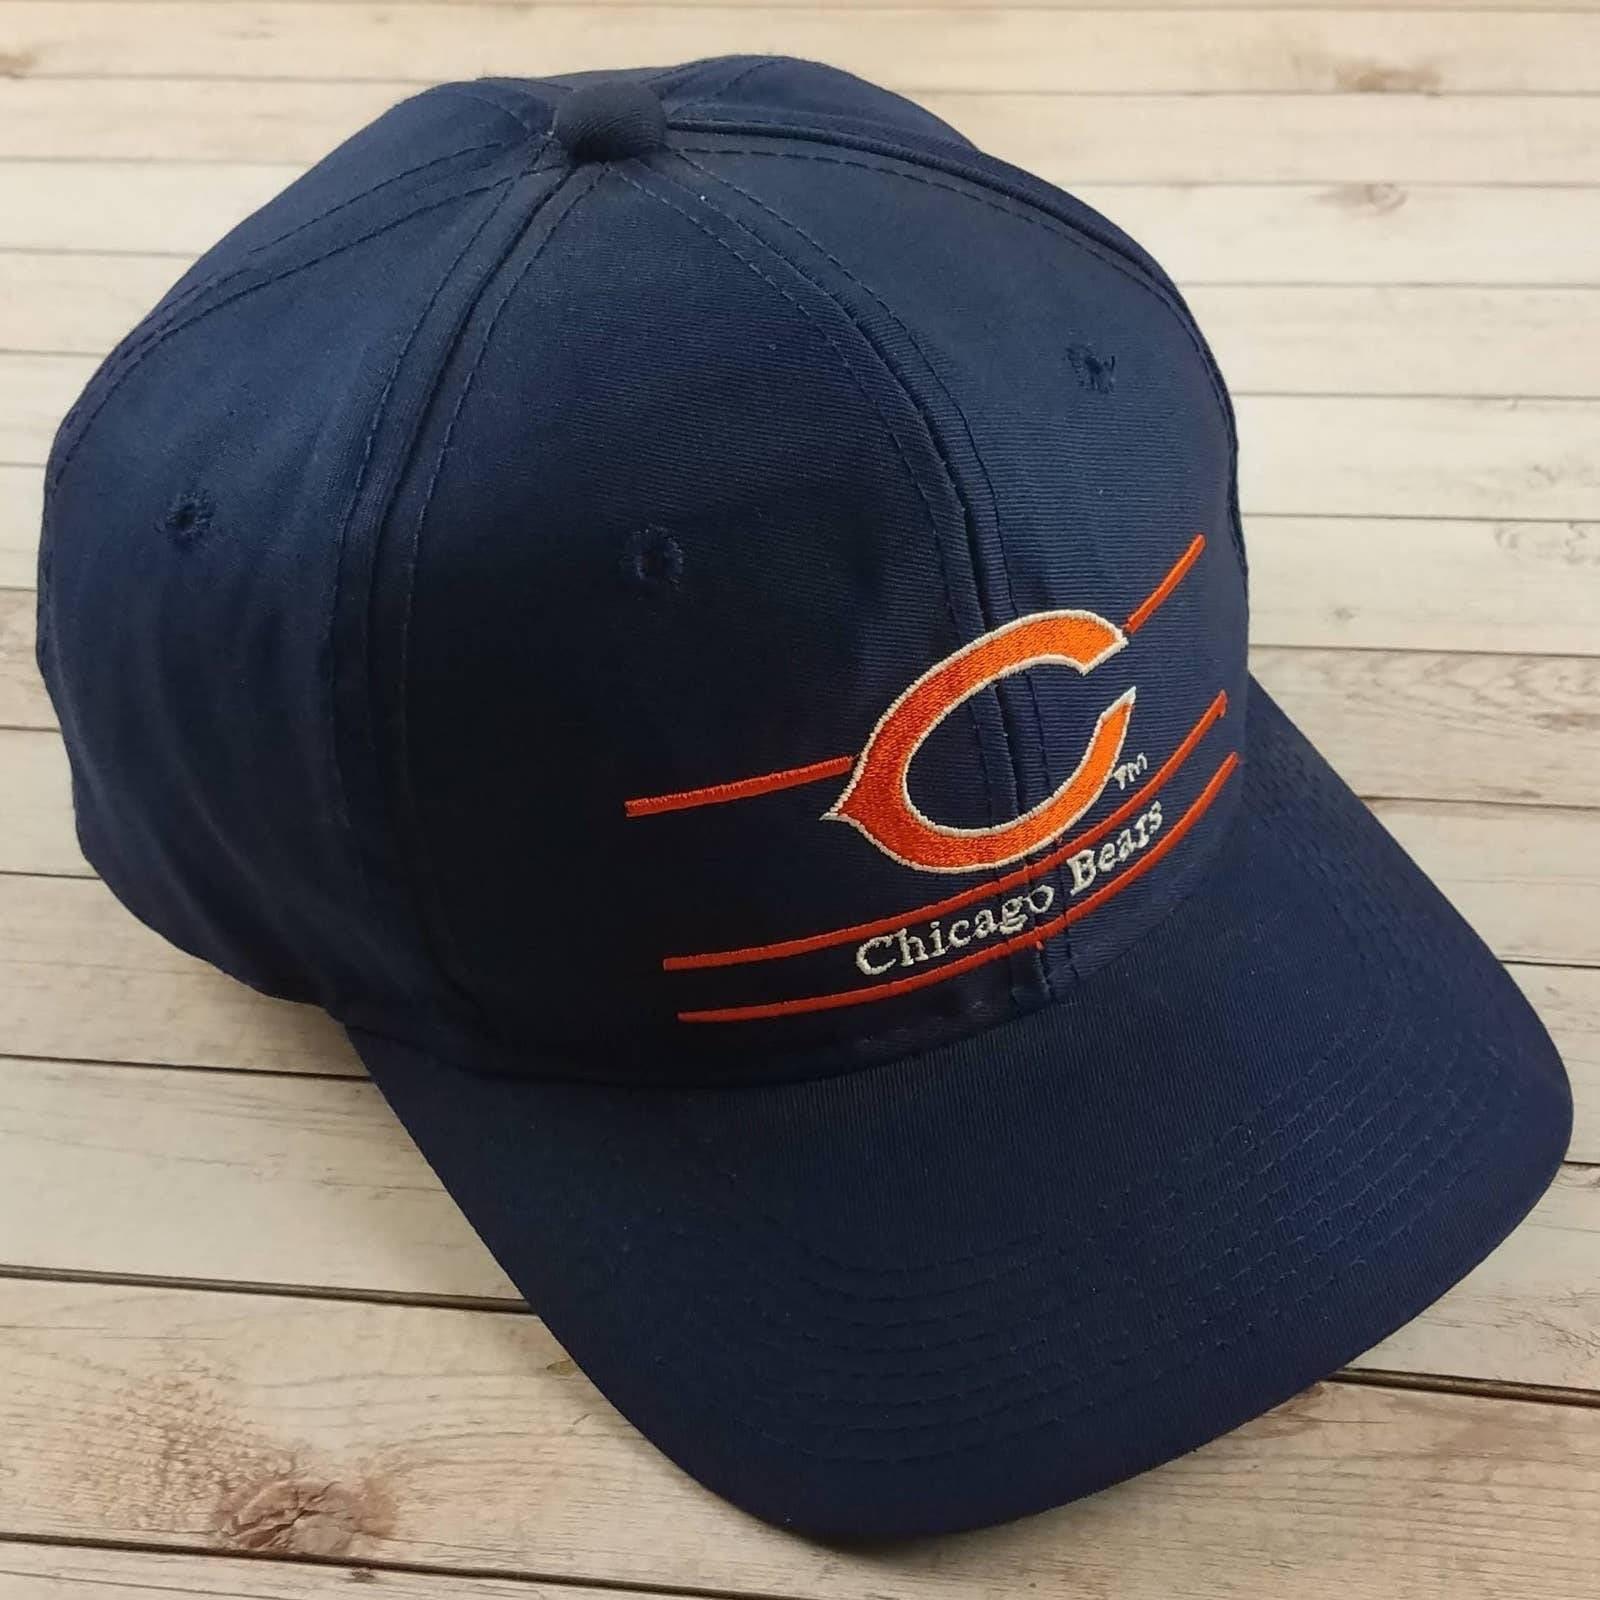 VTG 90s ChI Bears Split Bar Snapback Hat